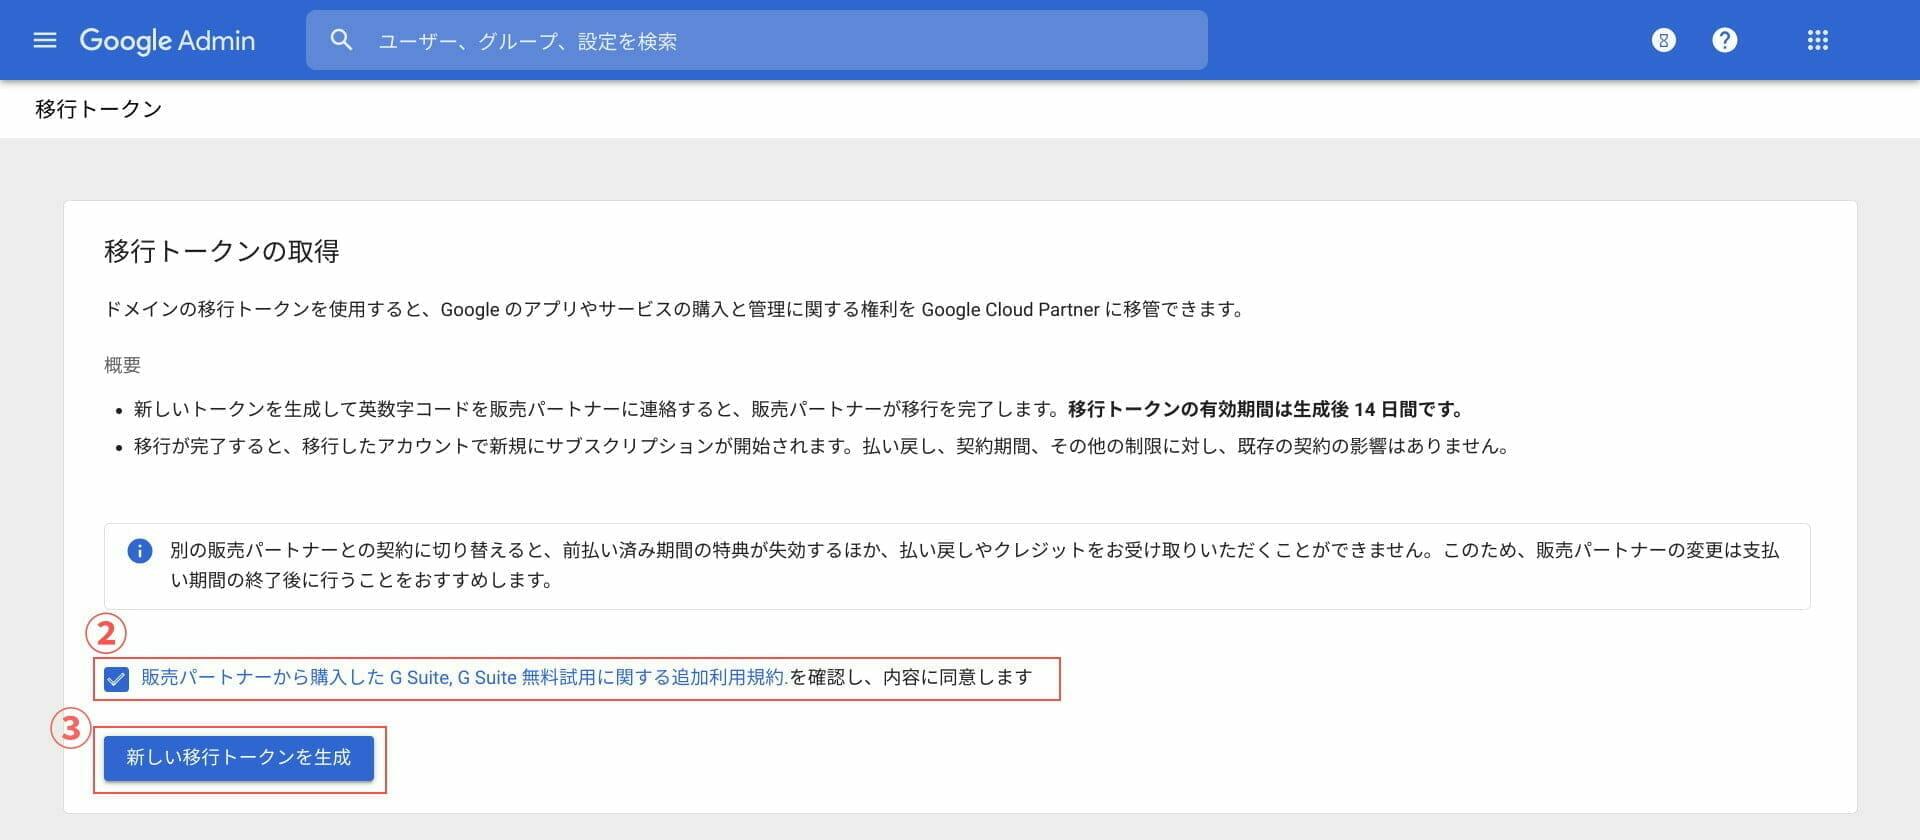 Google Admin:移行トークンの取得